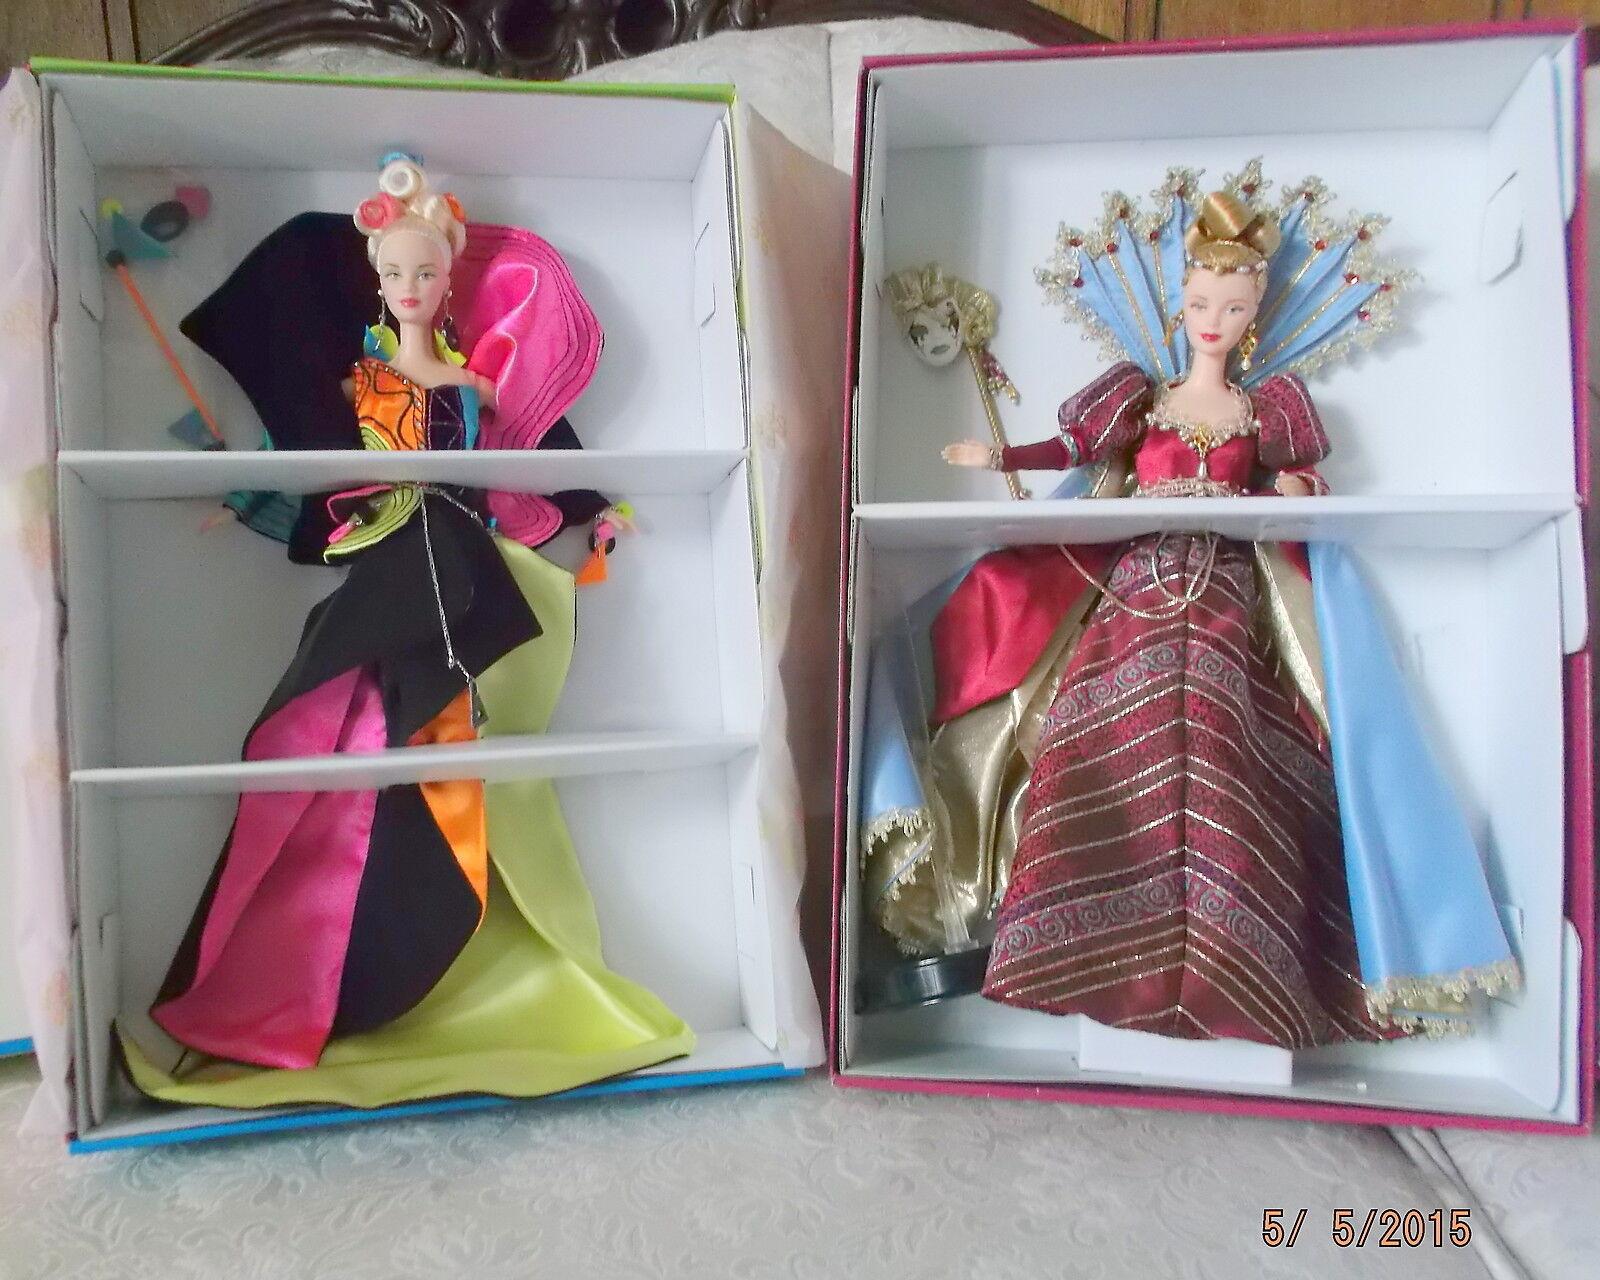 Lote 1998 nunca quitado de la Caja Mascarada Rendezvous & muestra 1999 veneciano riqueza Barbie